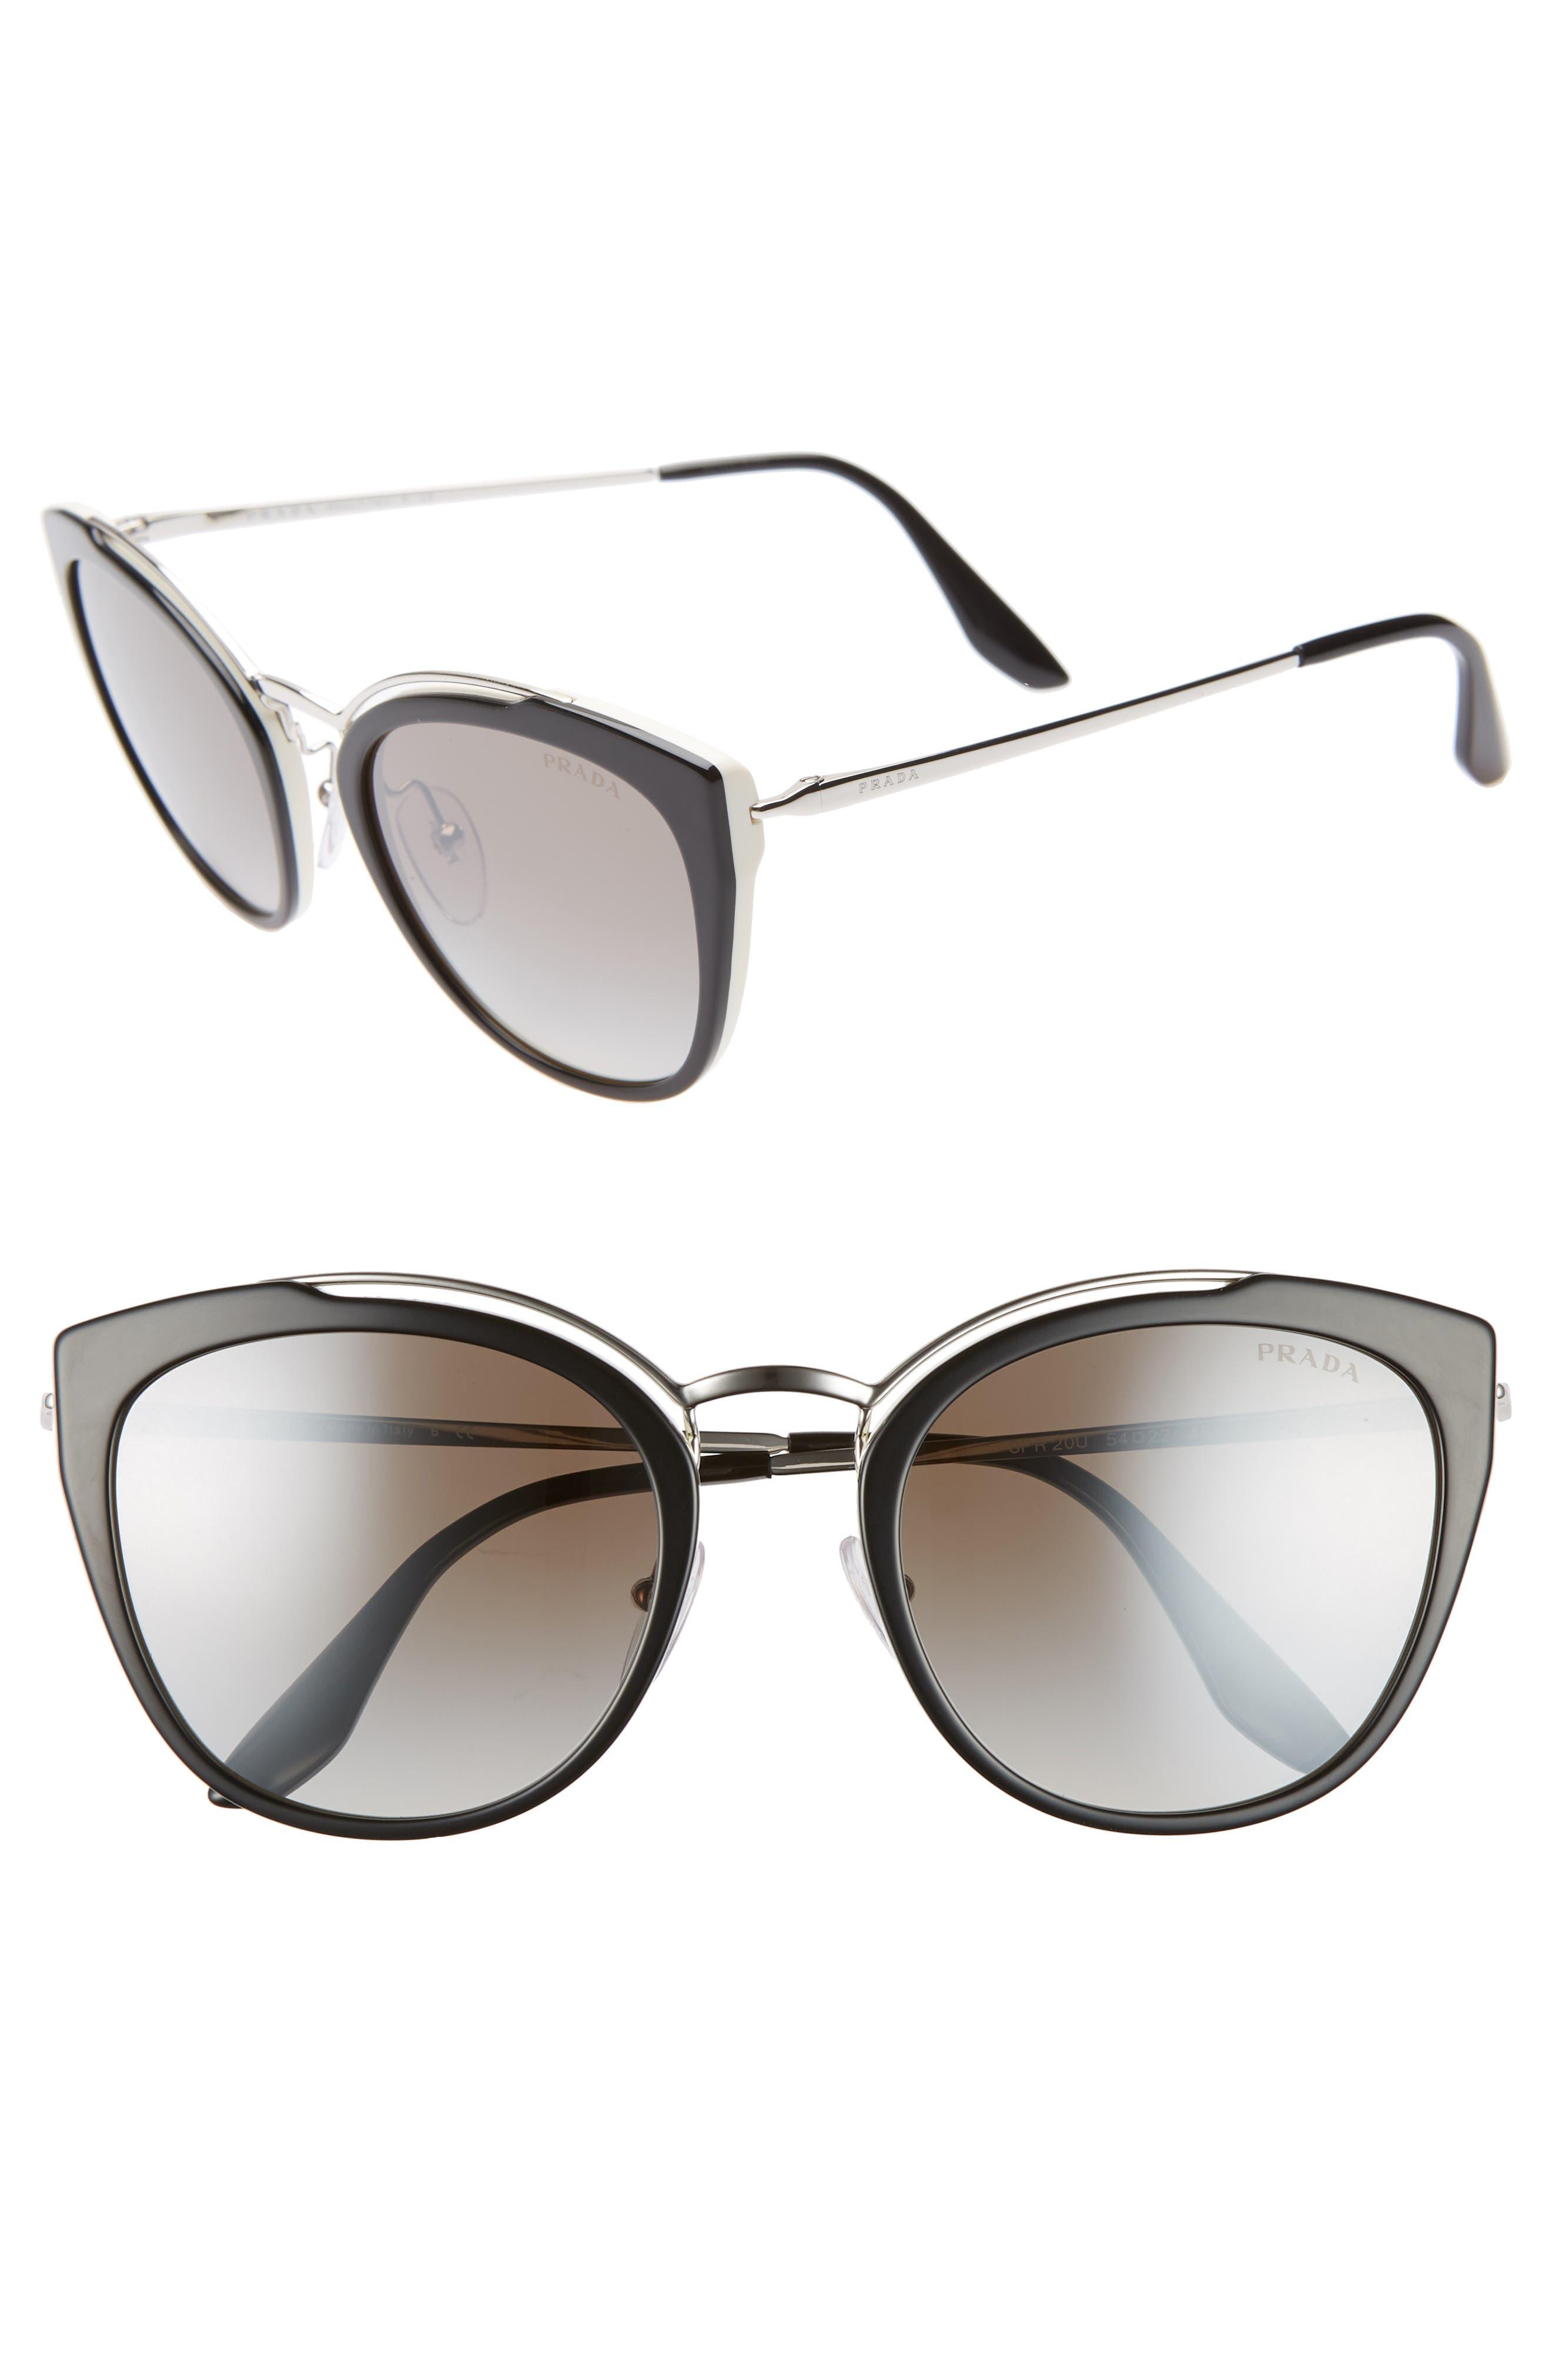 PRADA,                             54mm Gradient Cat Eye Sunglasses,                             Main thumbnail 1, color,                             BLACK/ SILVER GRADIENT MIRROR